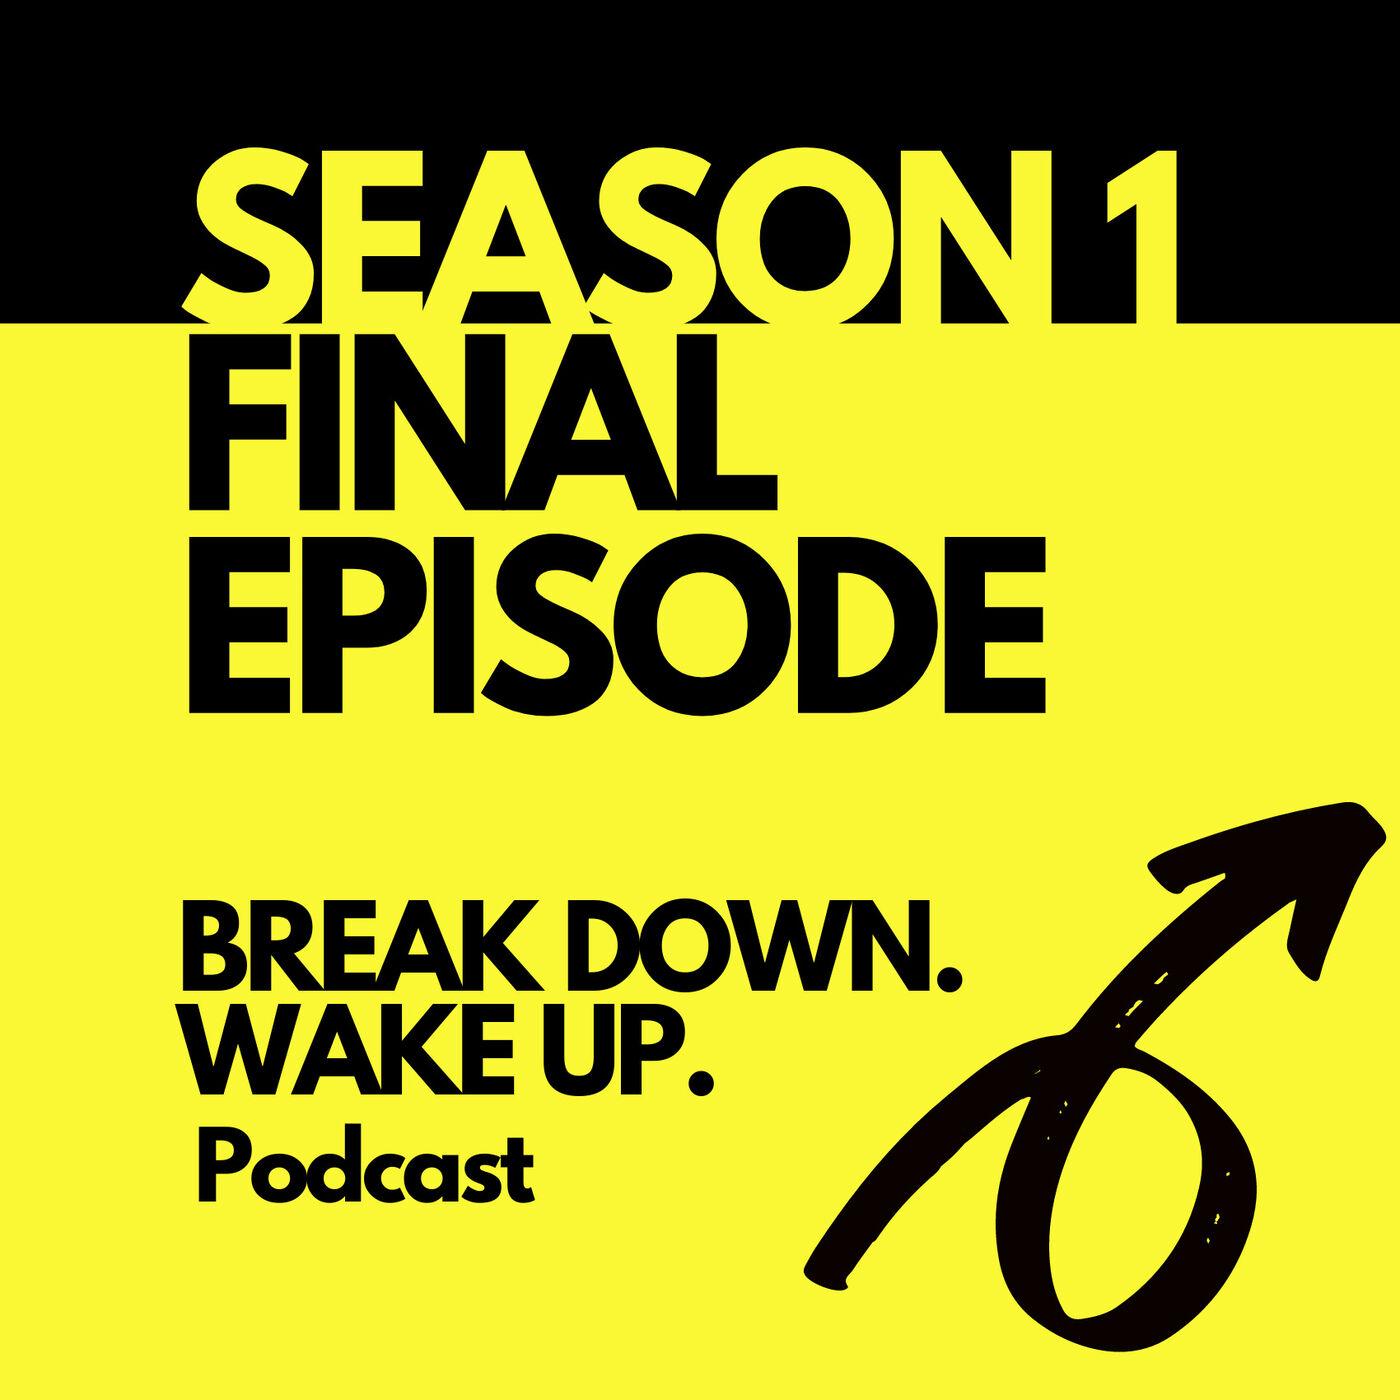 032 - FINAL EPISODE SEASON 1 Break Down. Wake Up. podcast :)